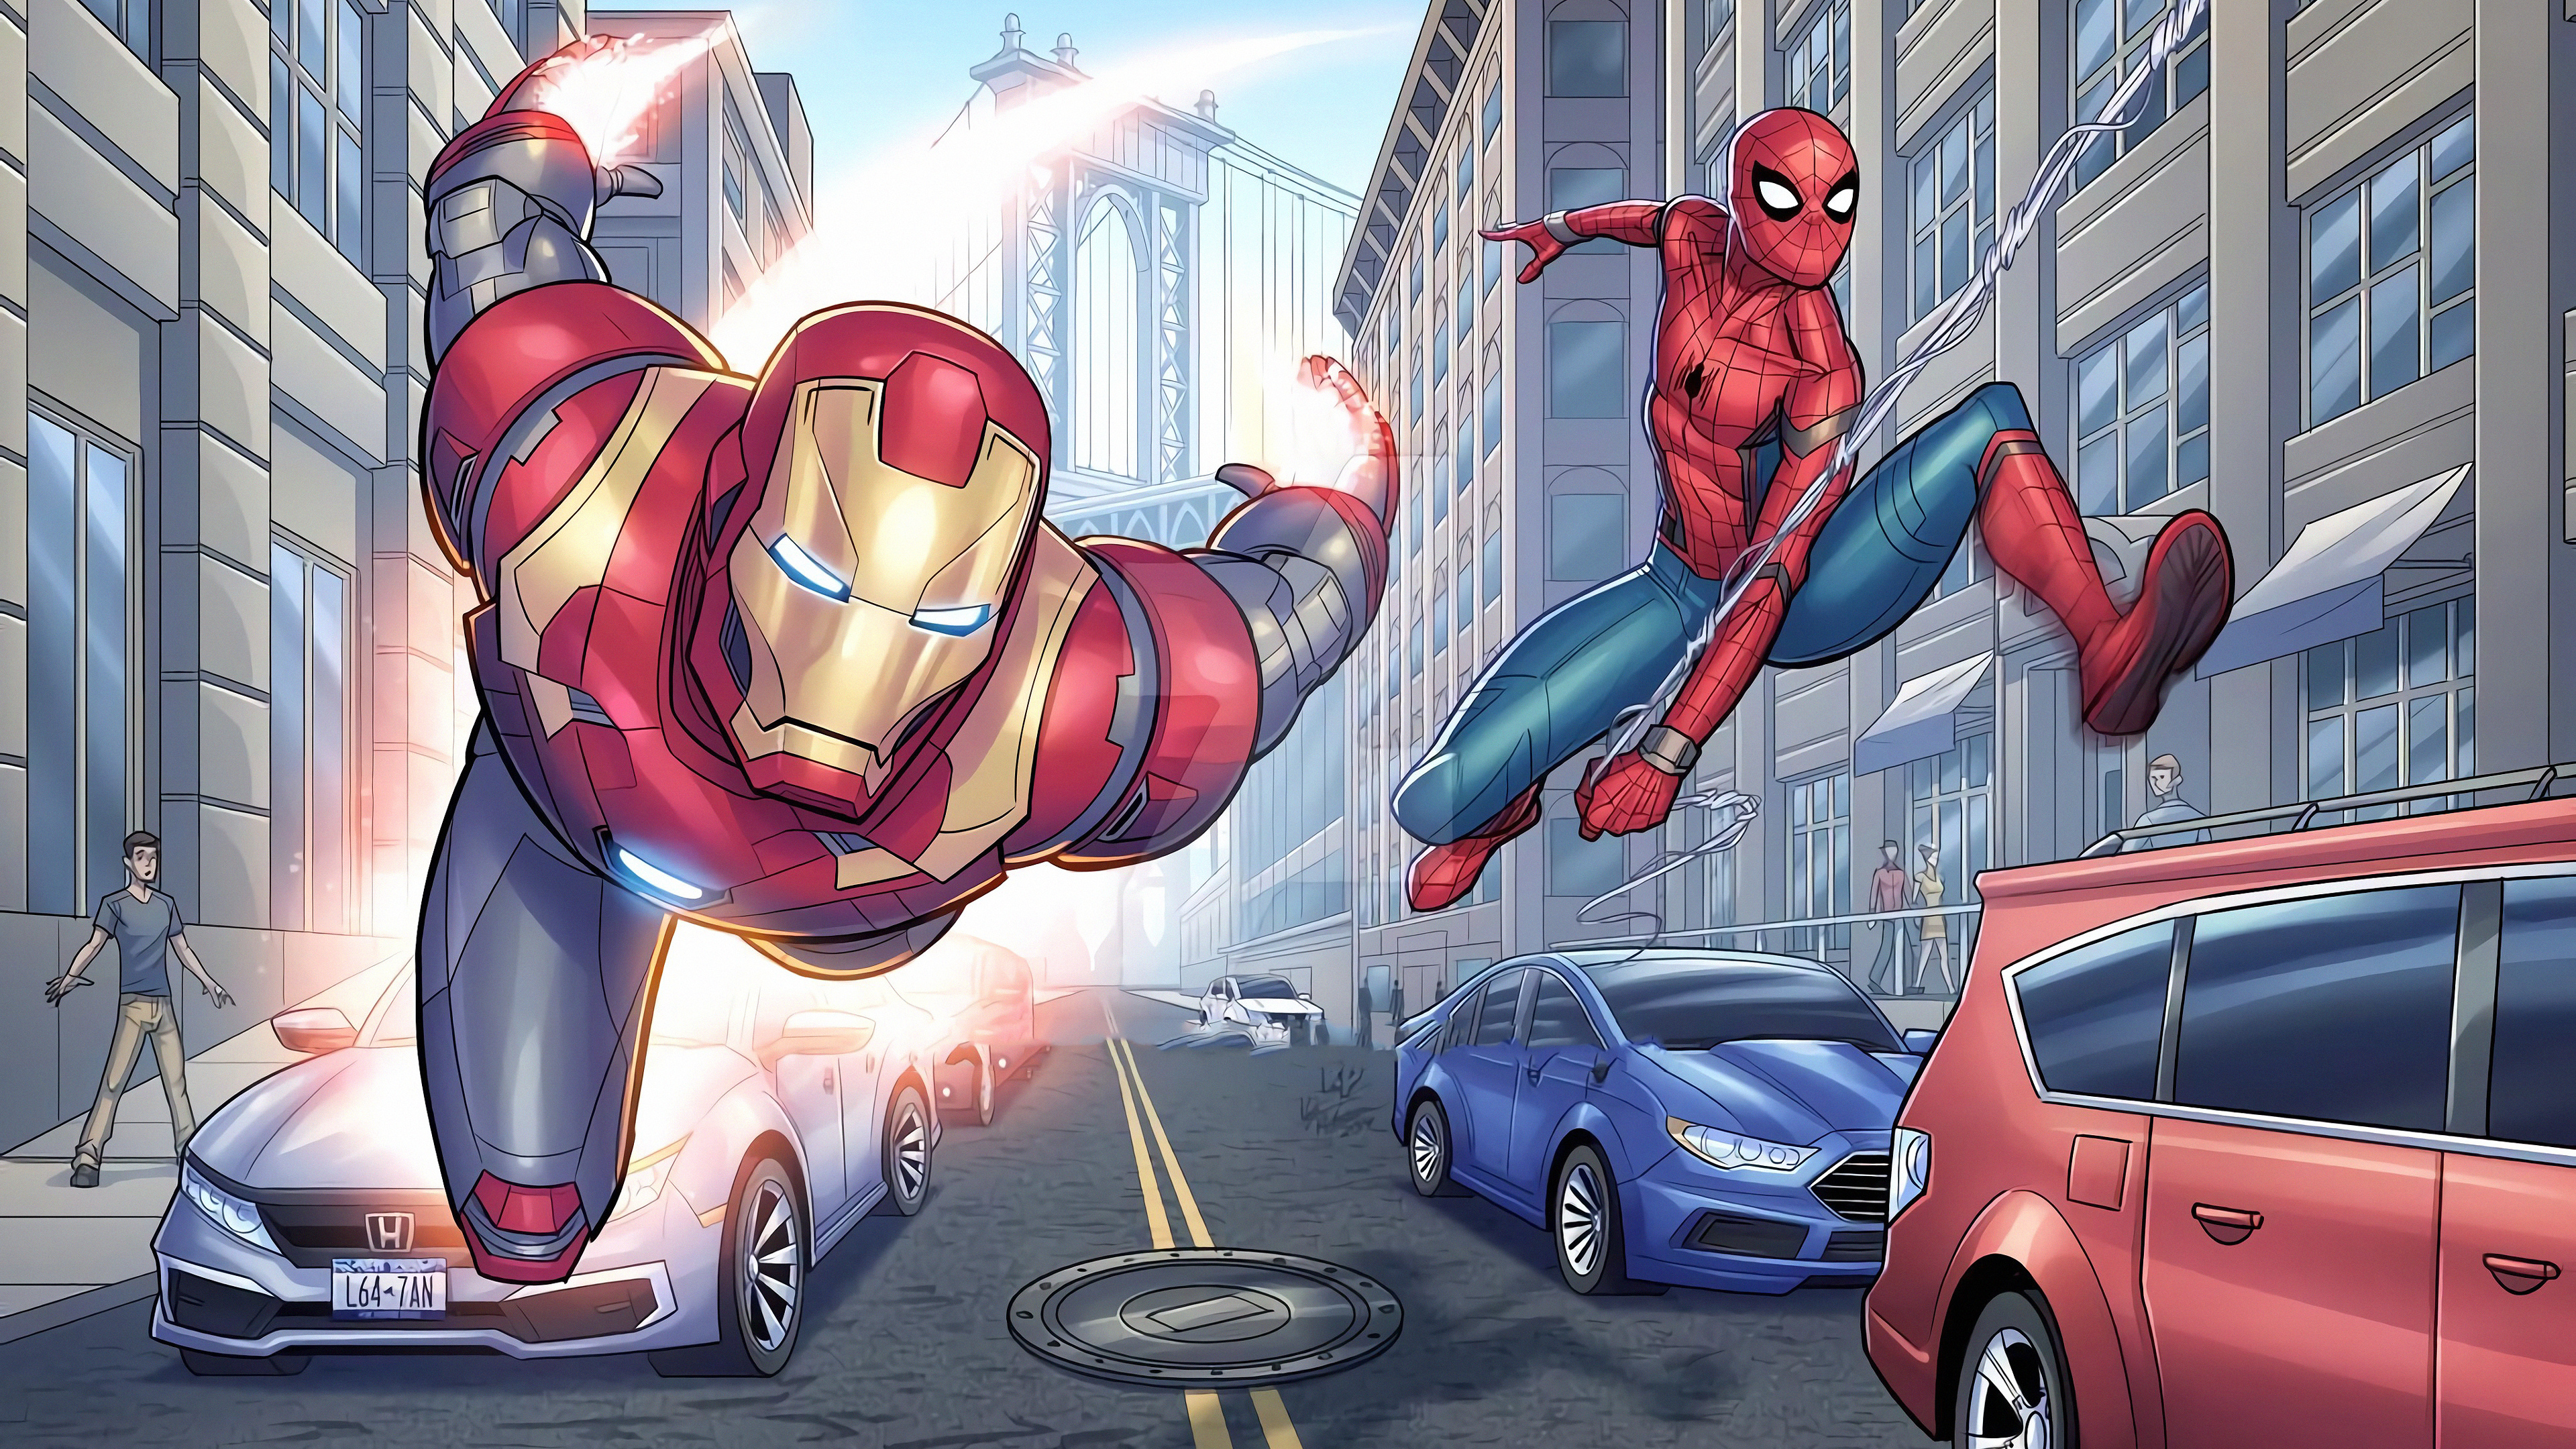 ironman spiderman 1569186652 - Ironman Spiderman - superheroes wallpapers, spiderman wallpapers, iron man wallpapers, hd-wallpapers, digital art wallpapers, artwork wallpapers, 4k-wallpapers